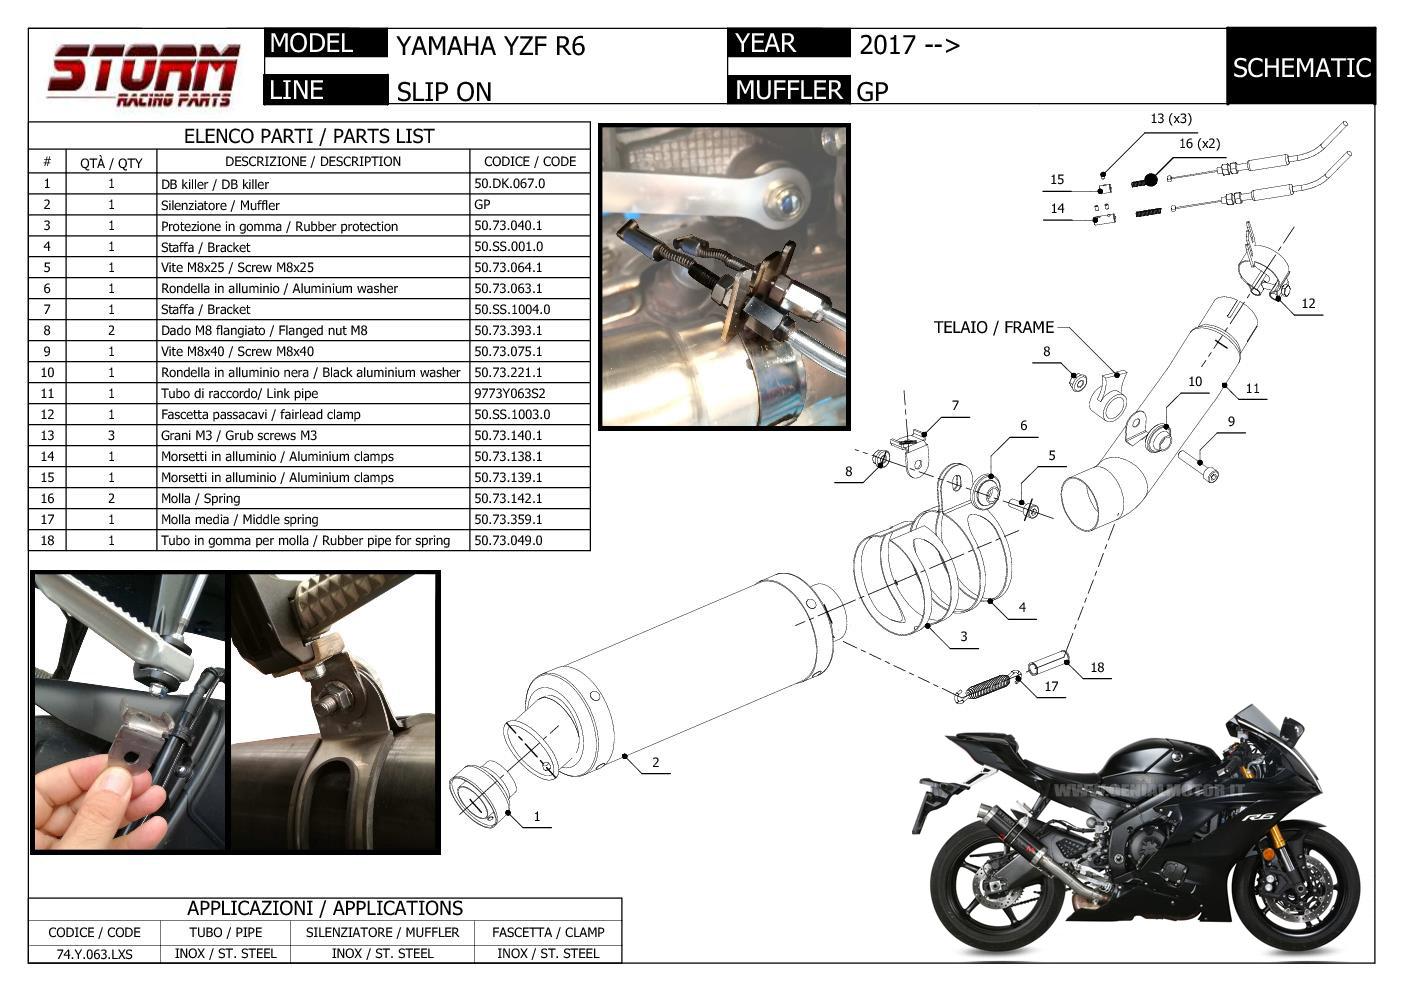 Exhaust Storm By Mivv Muffler Gp Nero Steel For Yamaha Yzf 600 R6 2017 >  2018